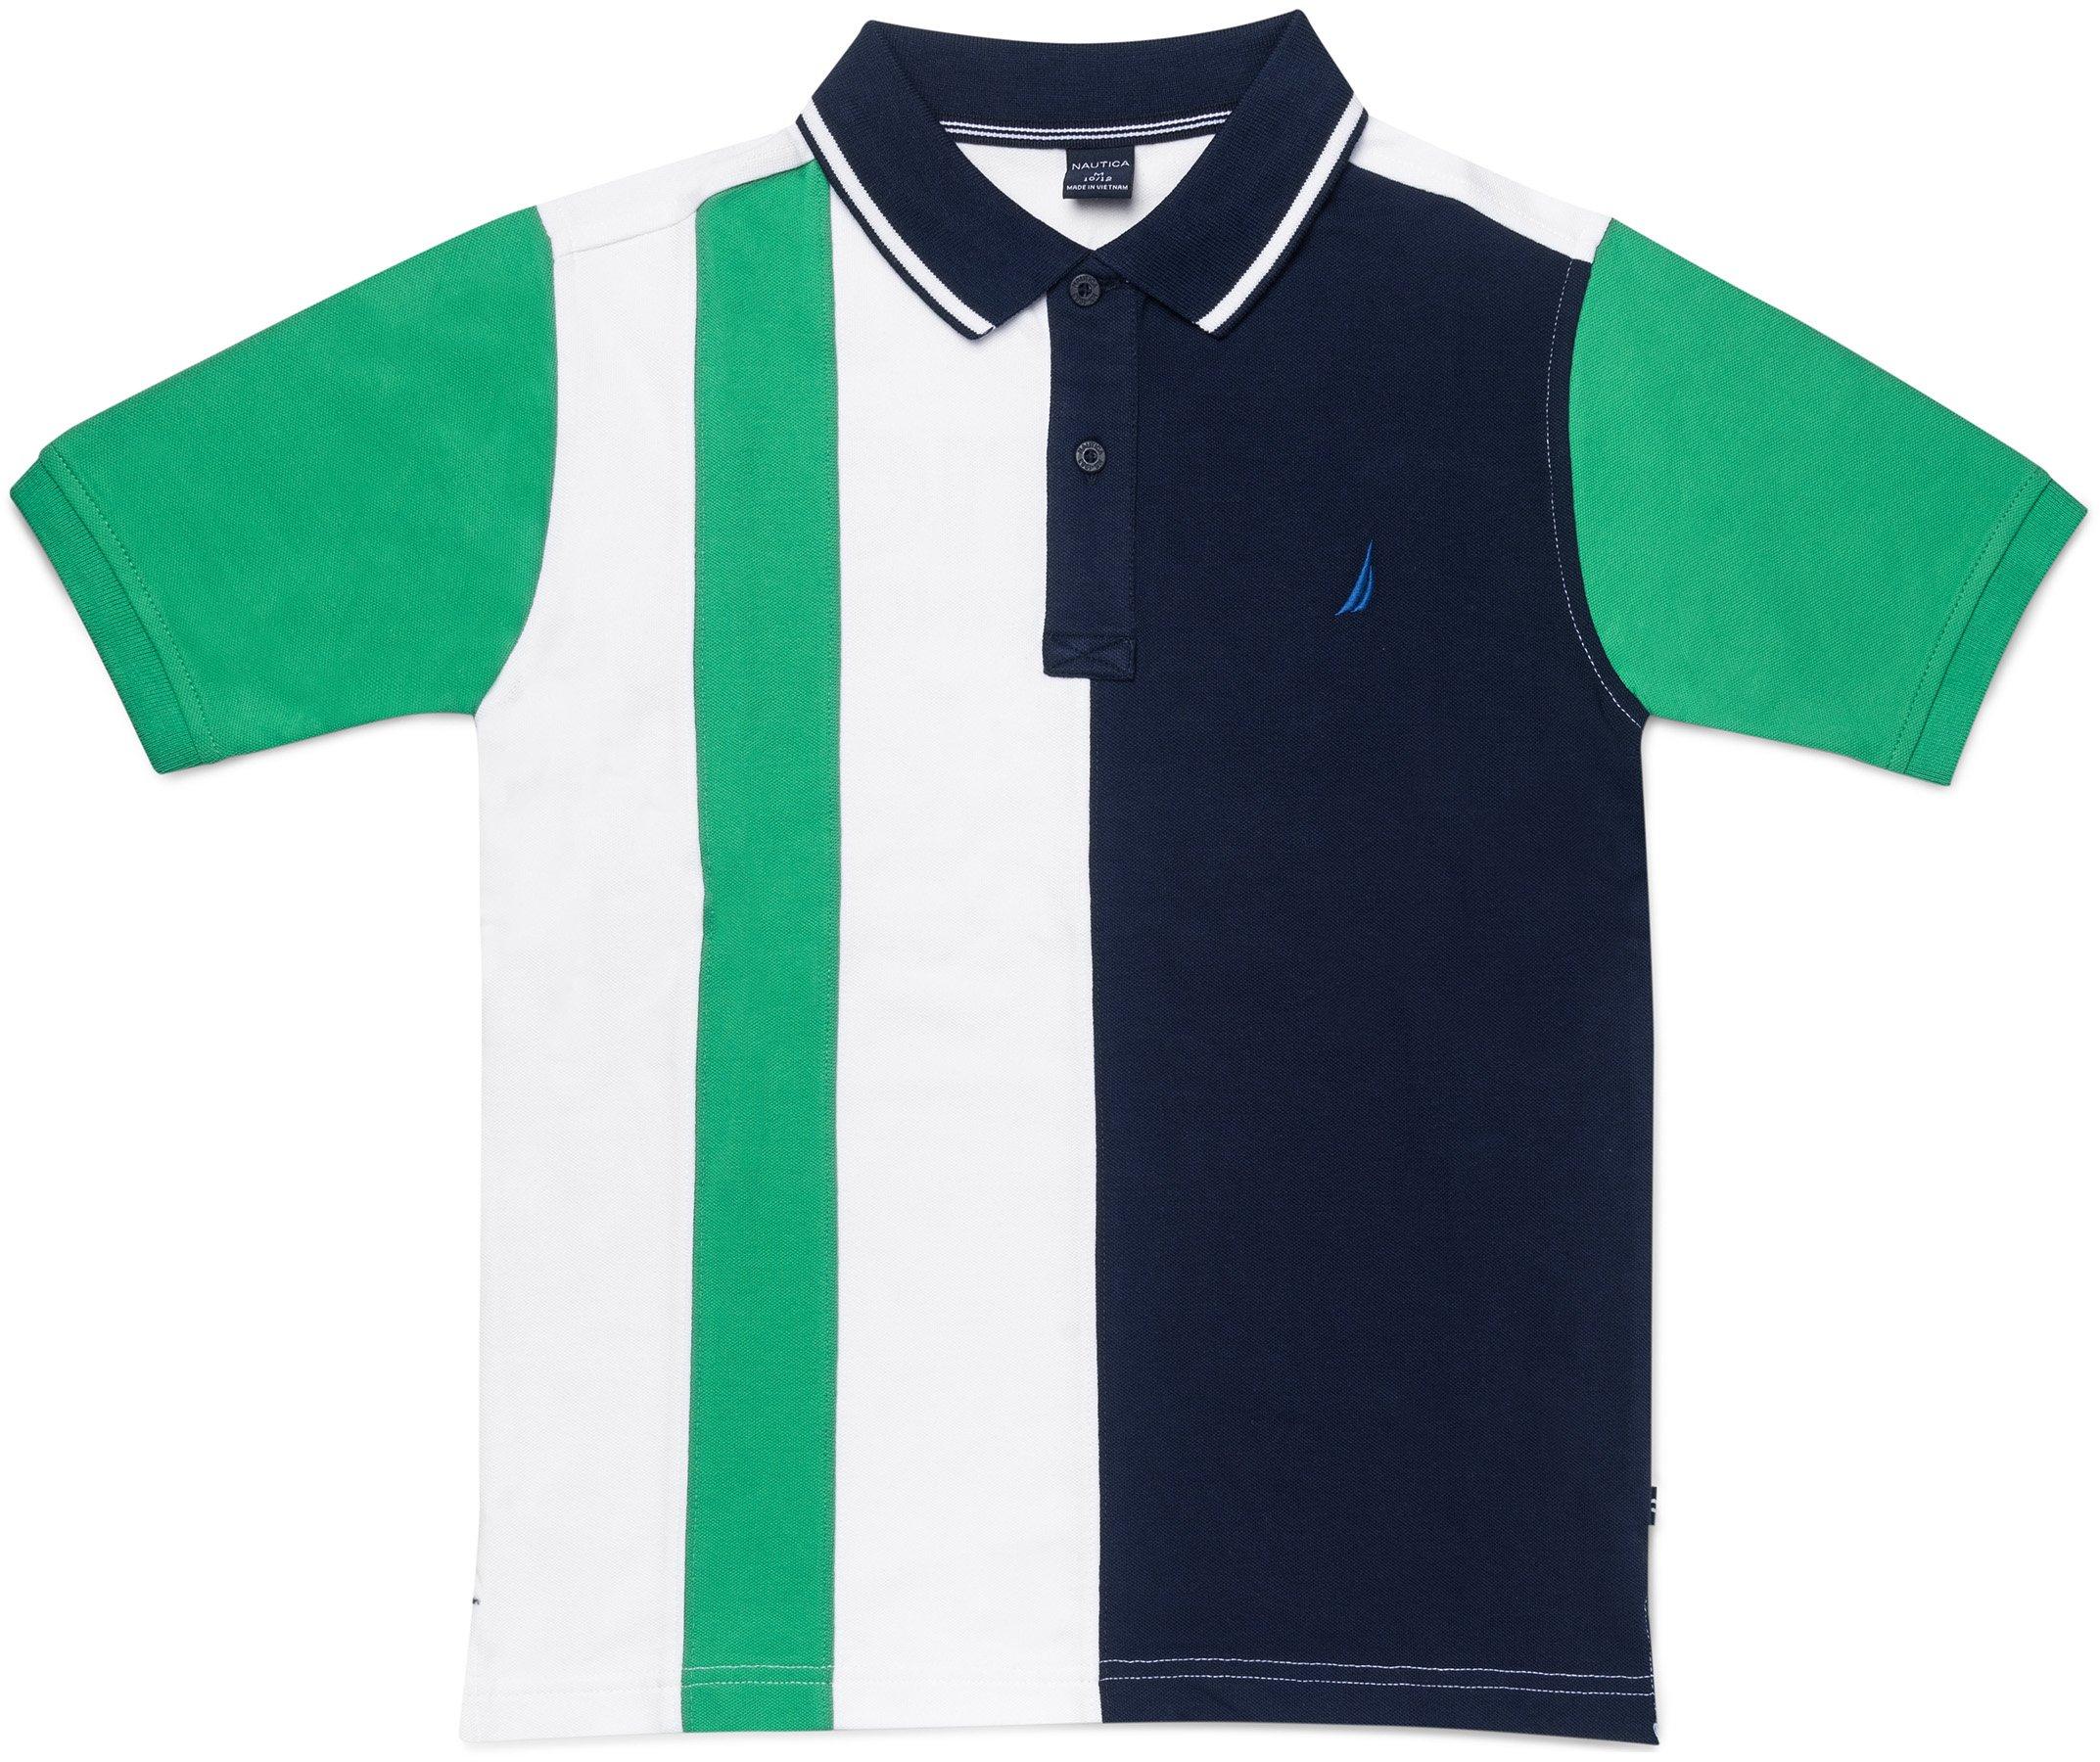 Nautica Boys' Short Sleeve Heritage Polo Shirt, Ballaster Bright Green, X-Large (18/20)